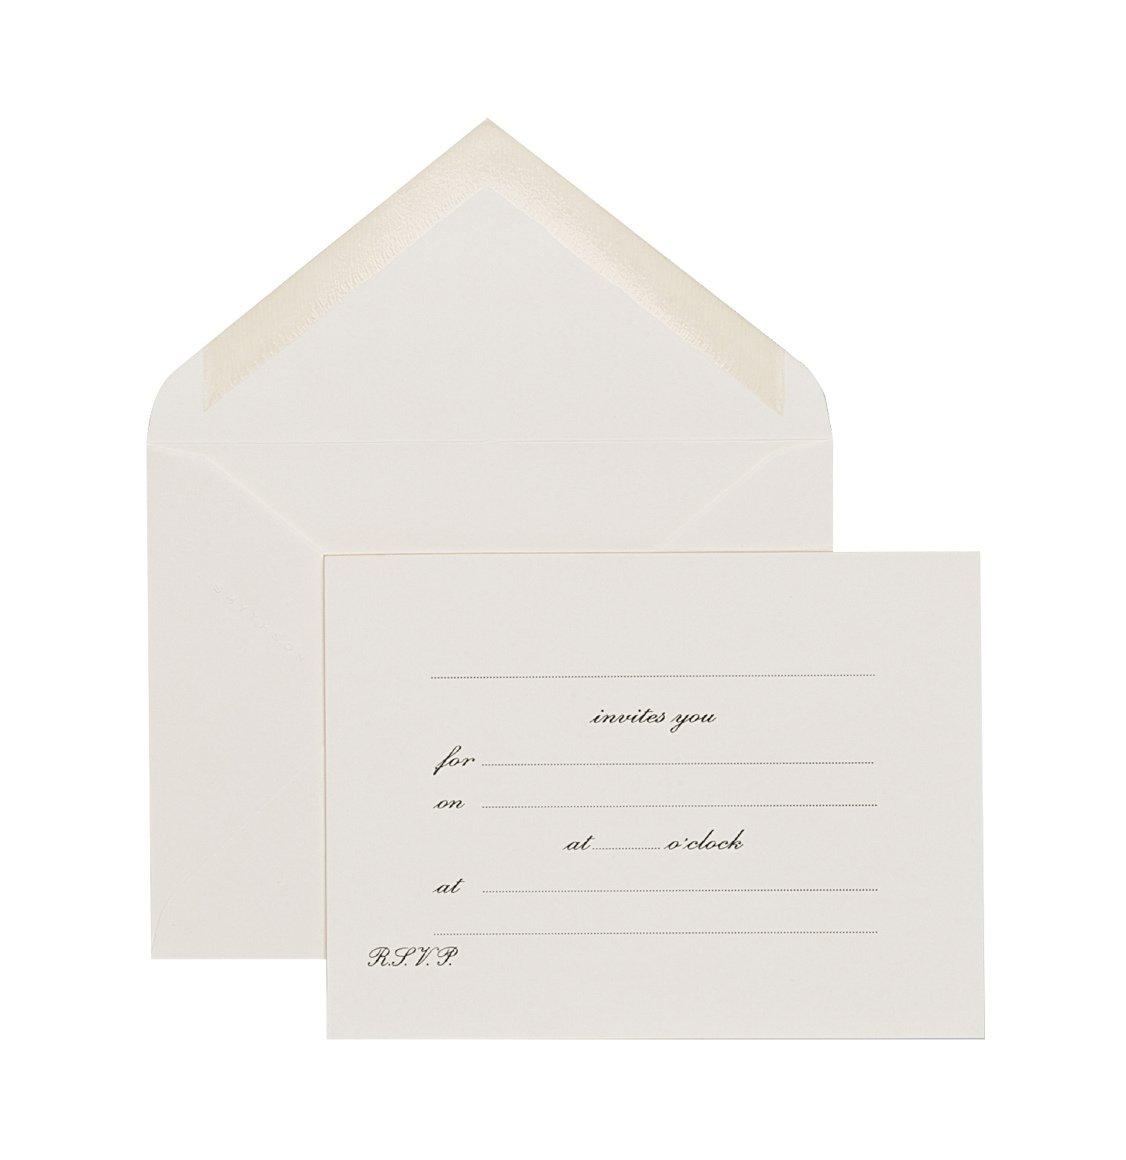 Smythson Invites You Invitation Cards